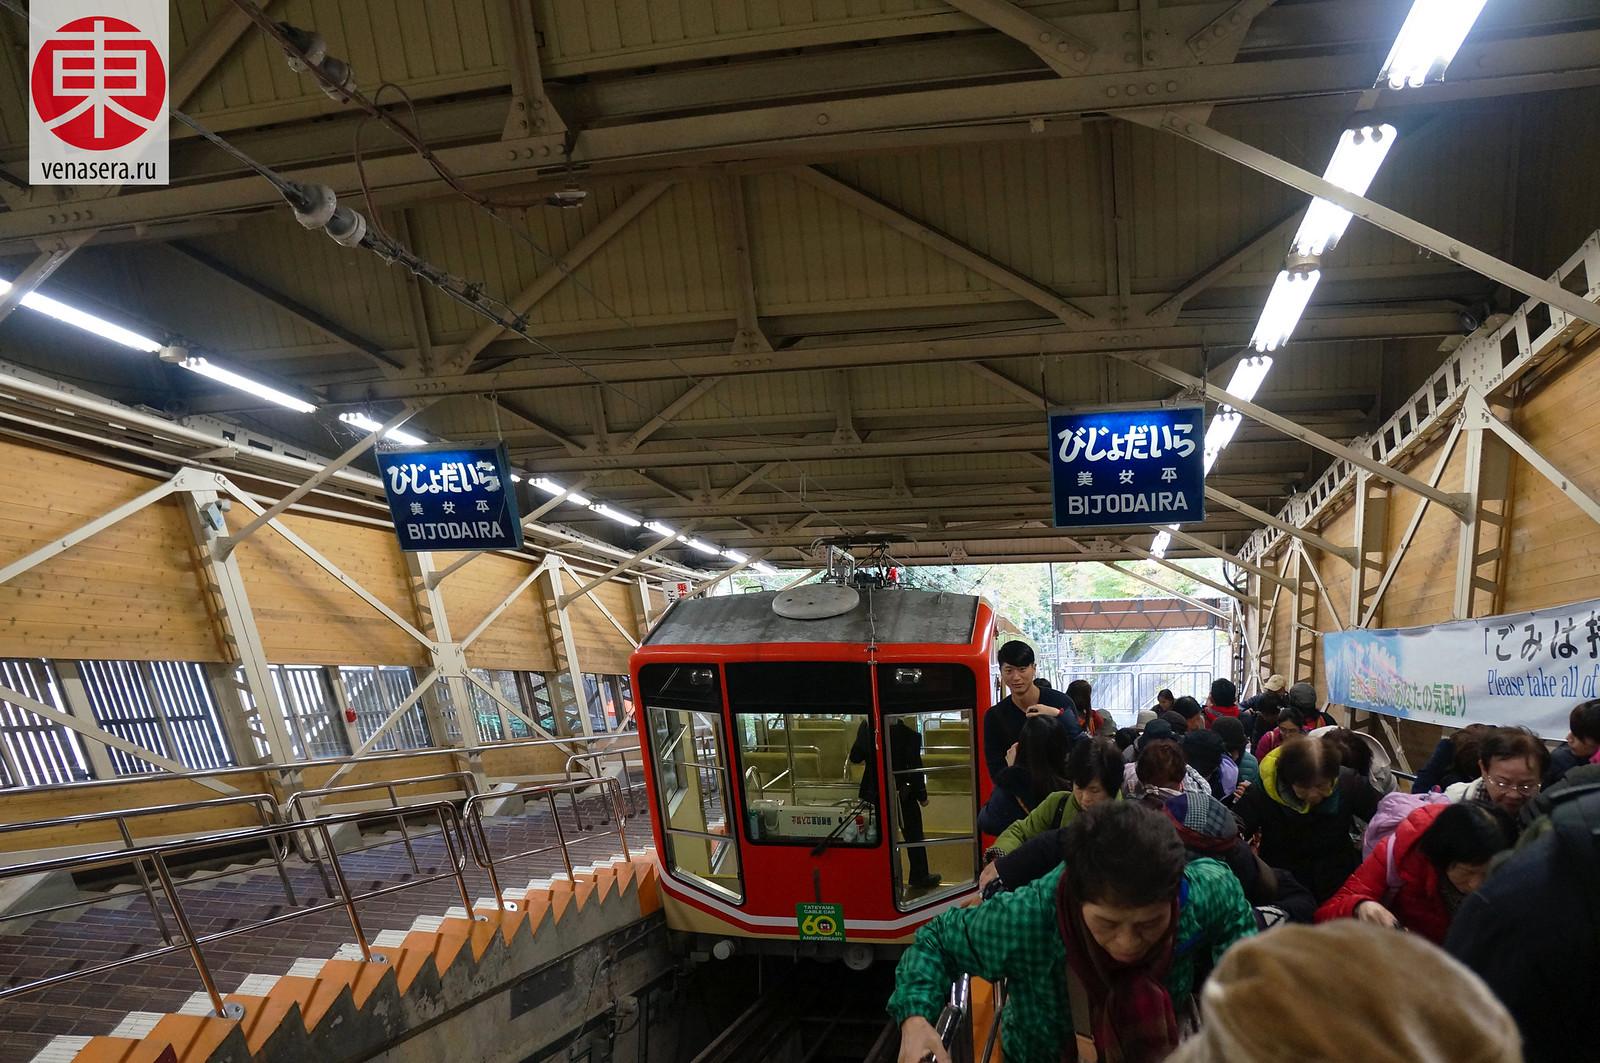 Станция Бидзёдайра (美女平), Японские Альпы Татэяма Куробэ, Татэяма Куробэ, Tateyama Kurobe Alpine Route, 立山黒部, 立山黒部アルペンルート